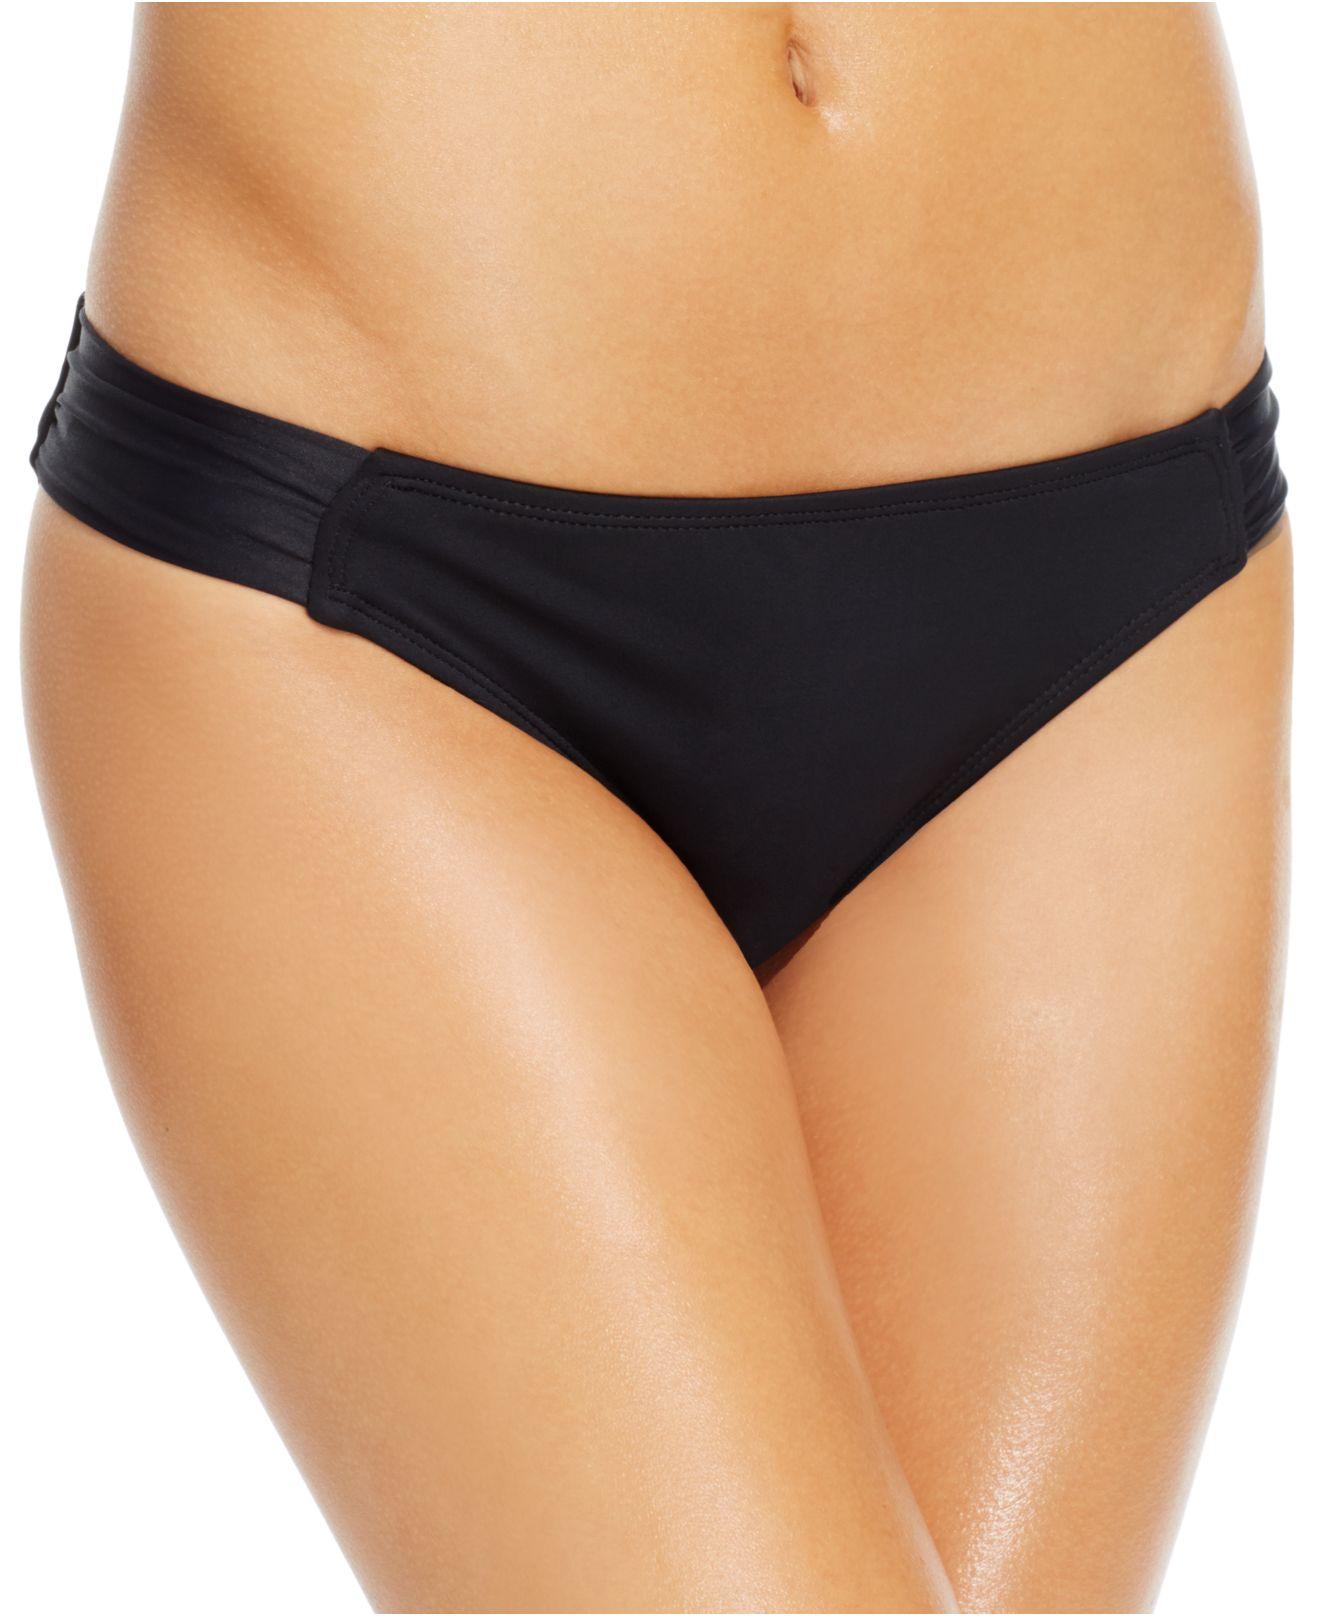 Bikini bottom ruched